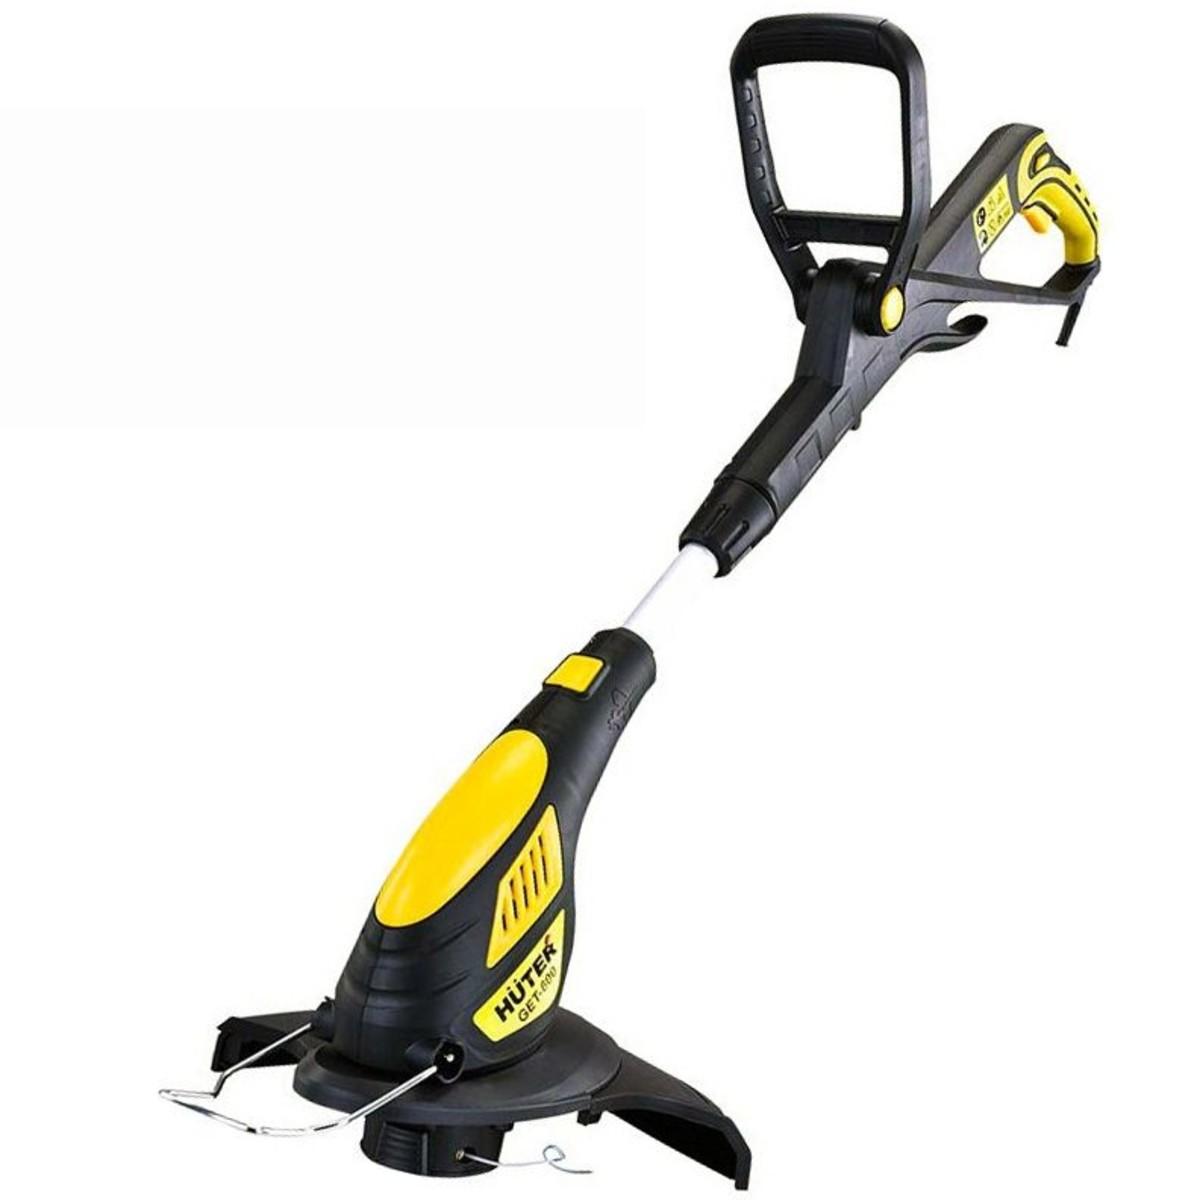 Триммер электрический Huter GET-RS32 600 Вт